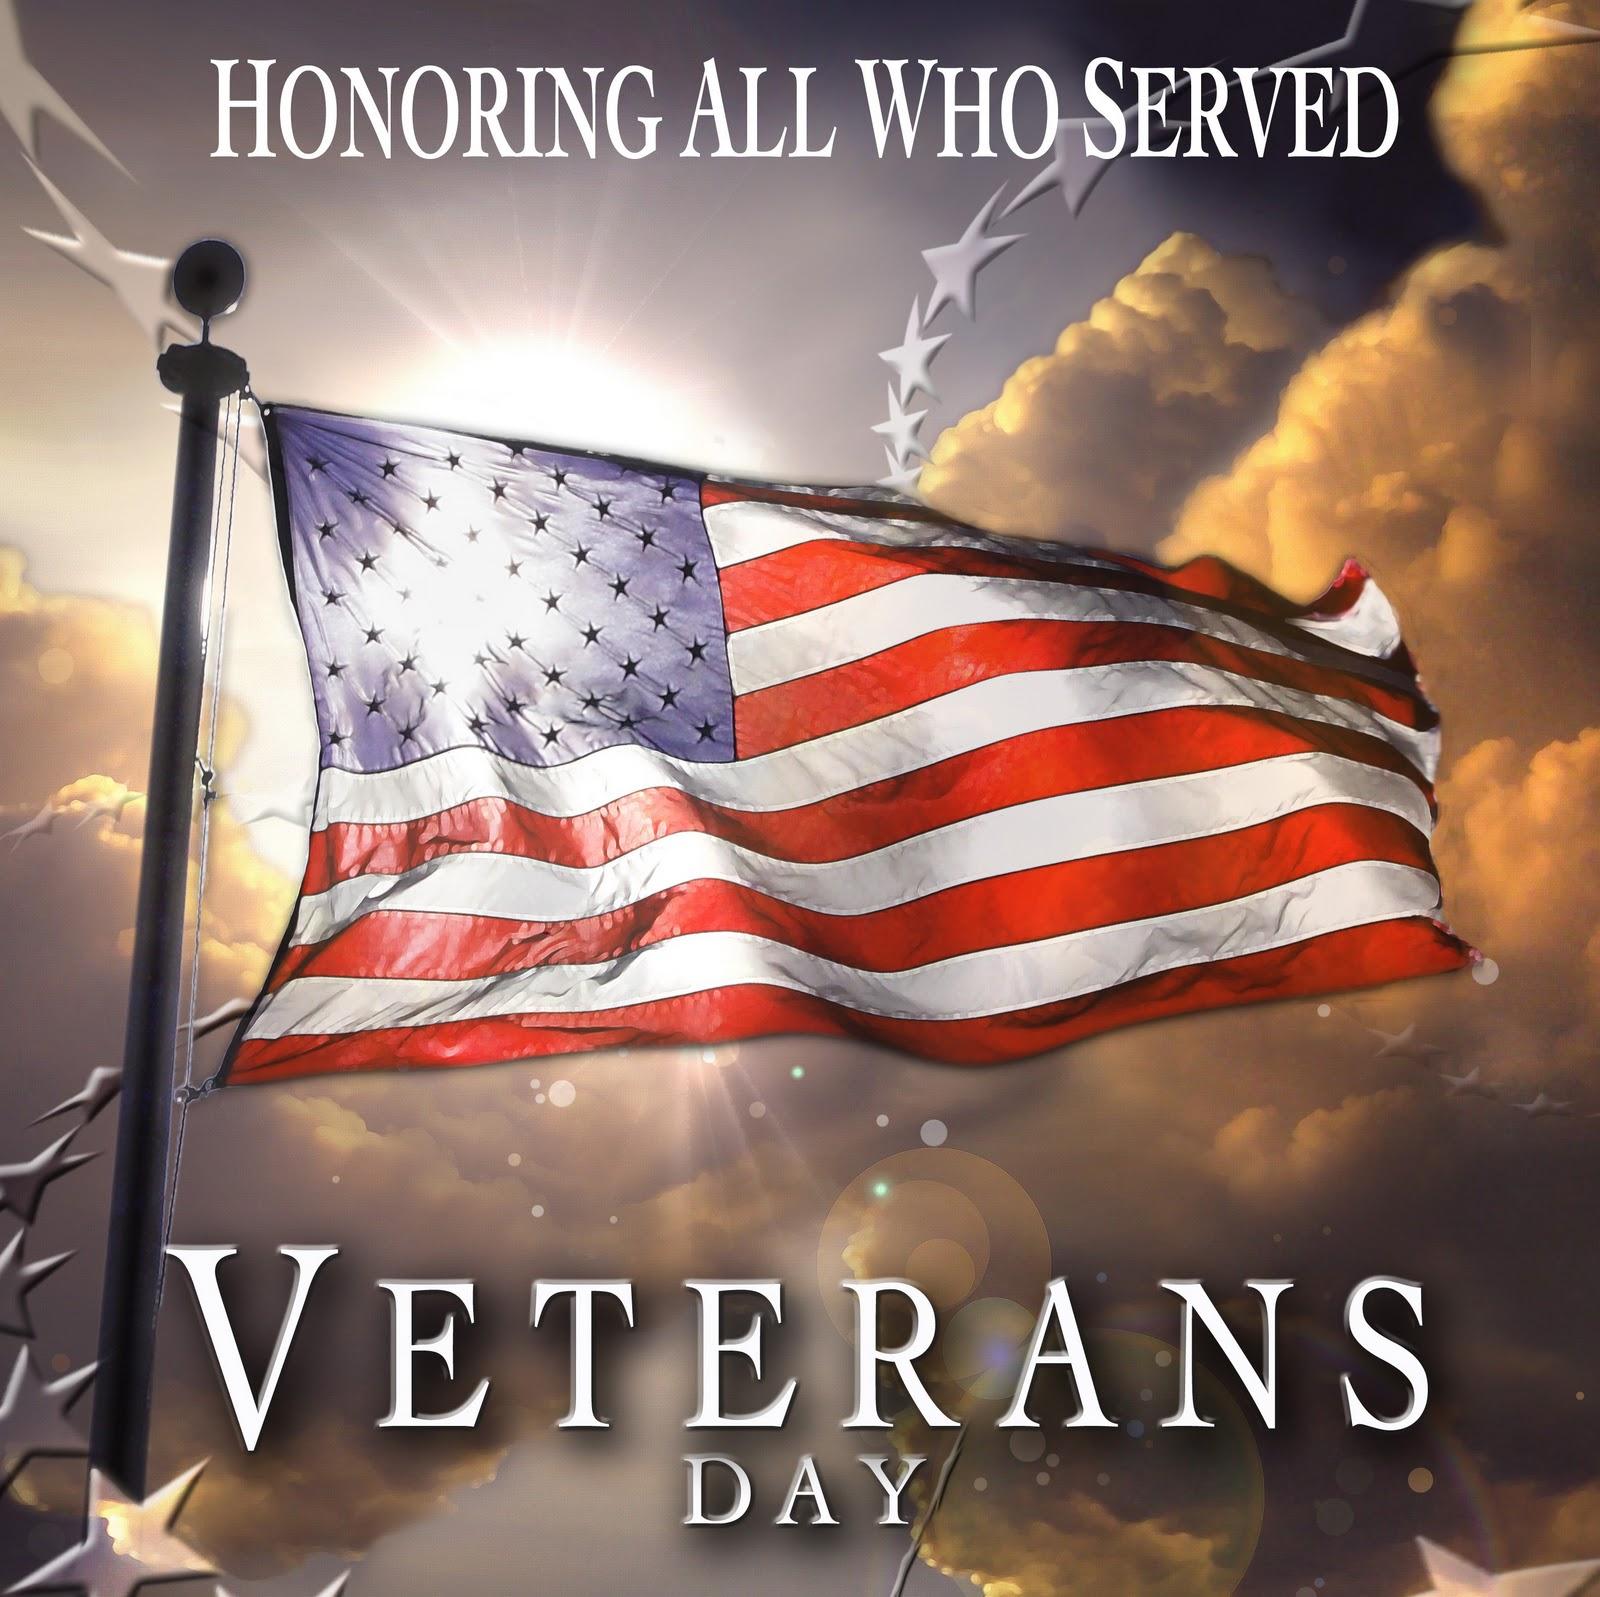 veterans_day_poster1a.jpg